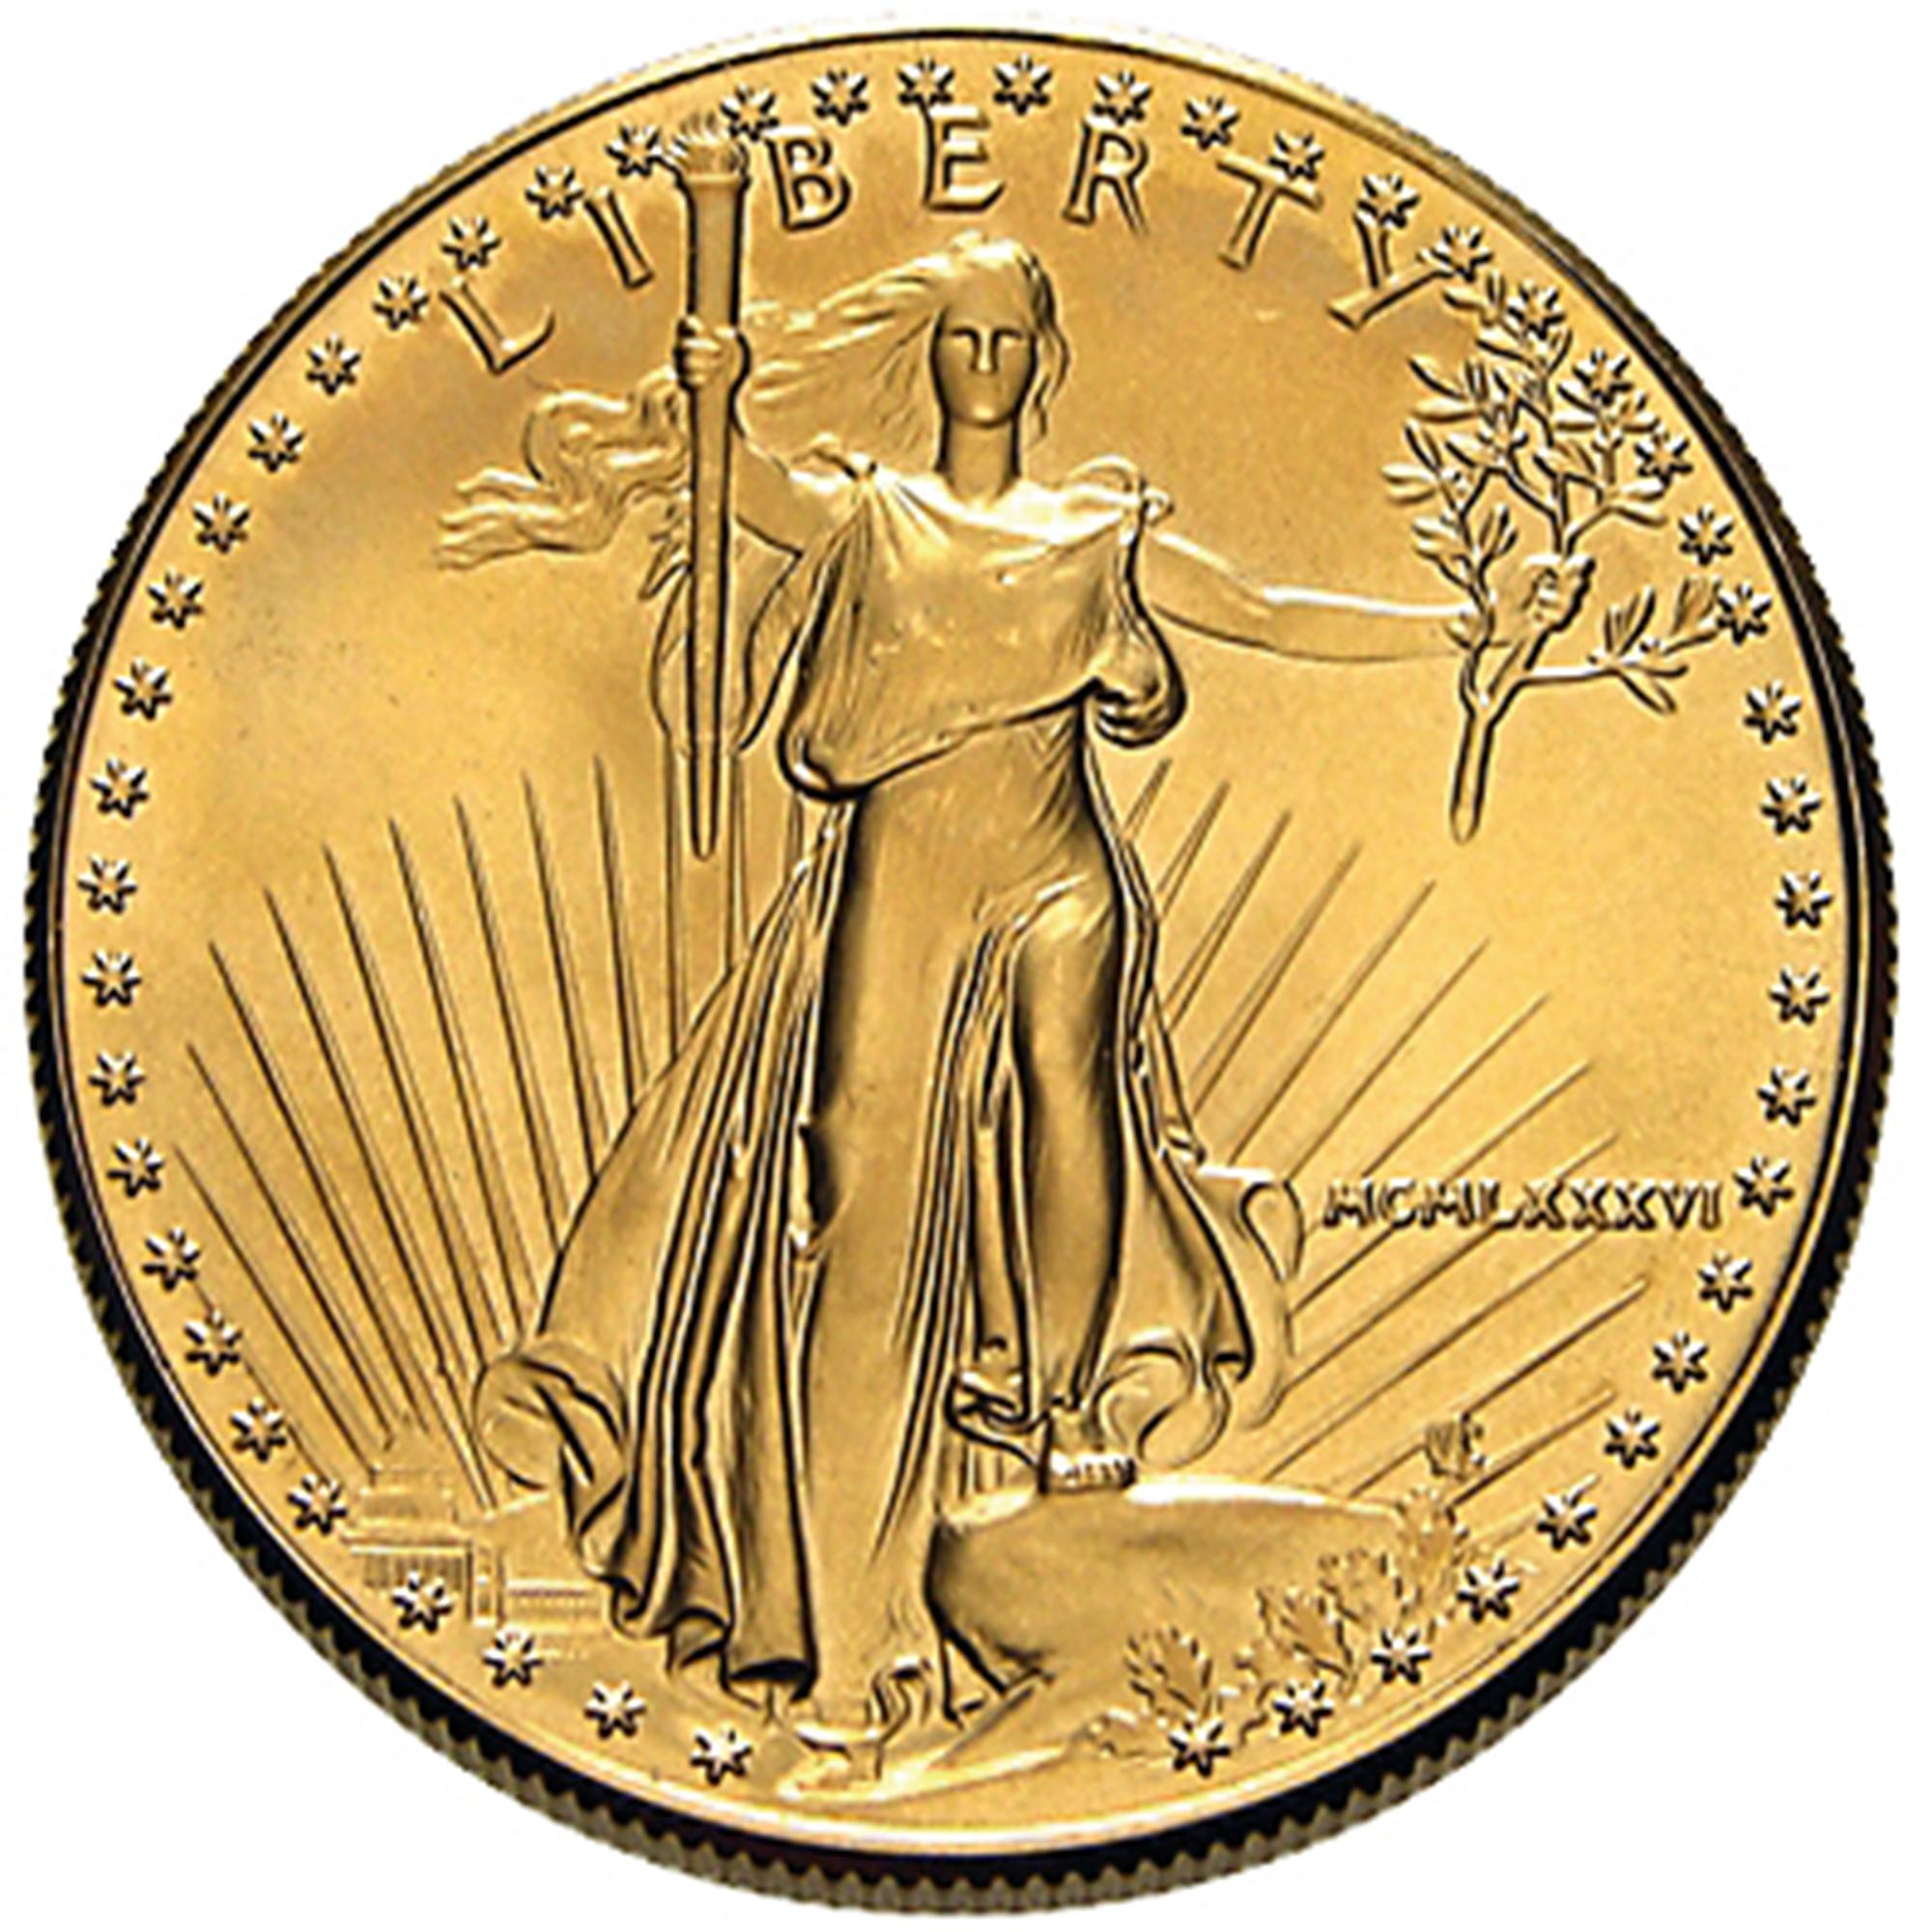 1 Unze Gold American Eagle Online Kaufen Haspa Goldshop Haspashop